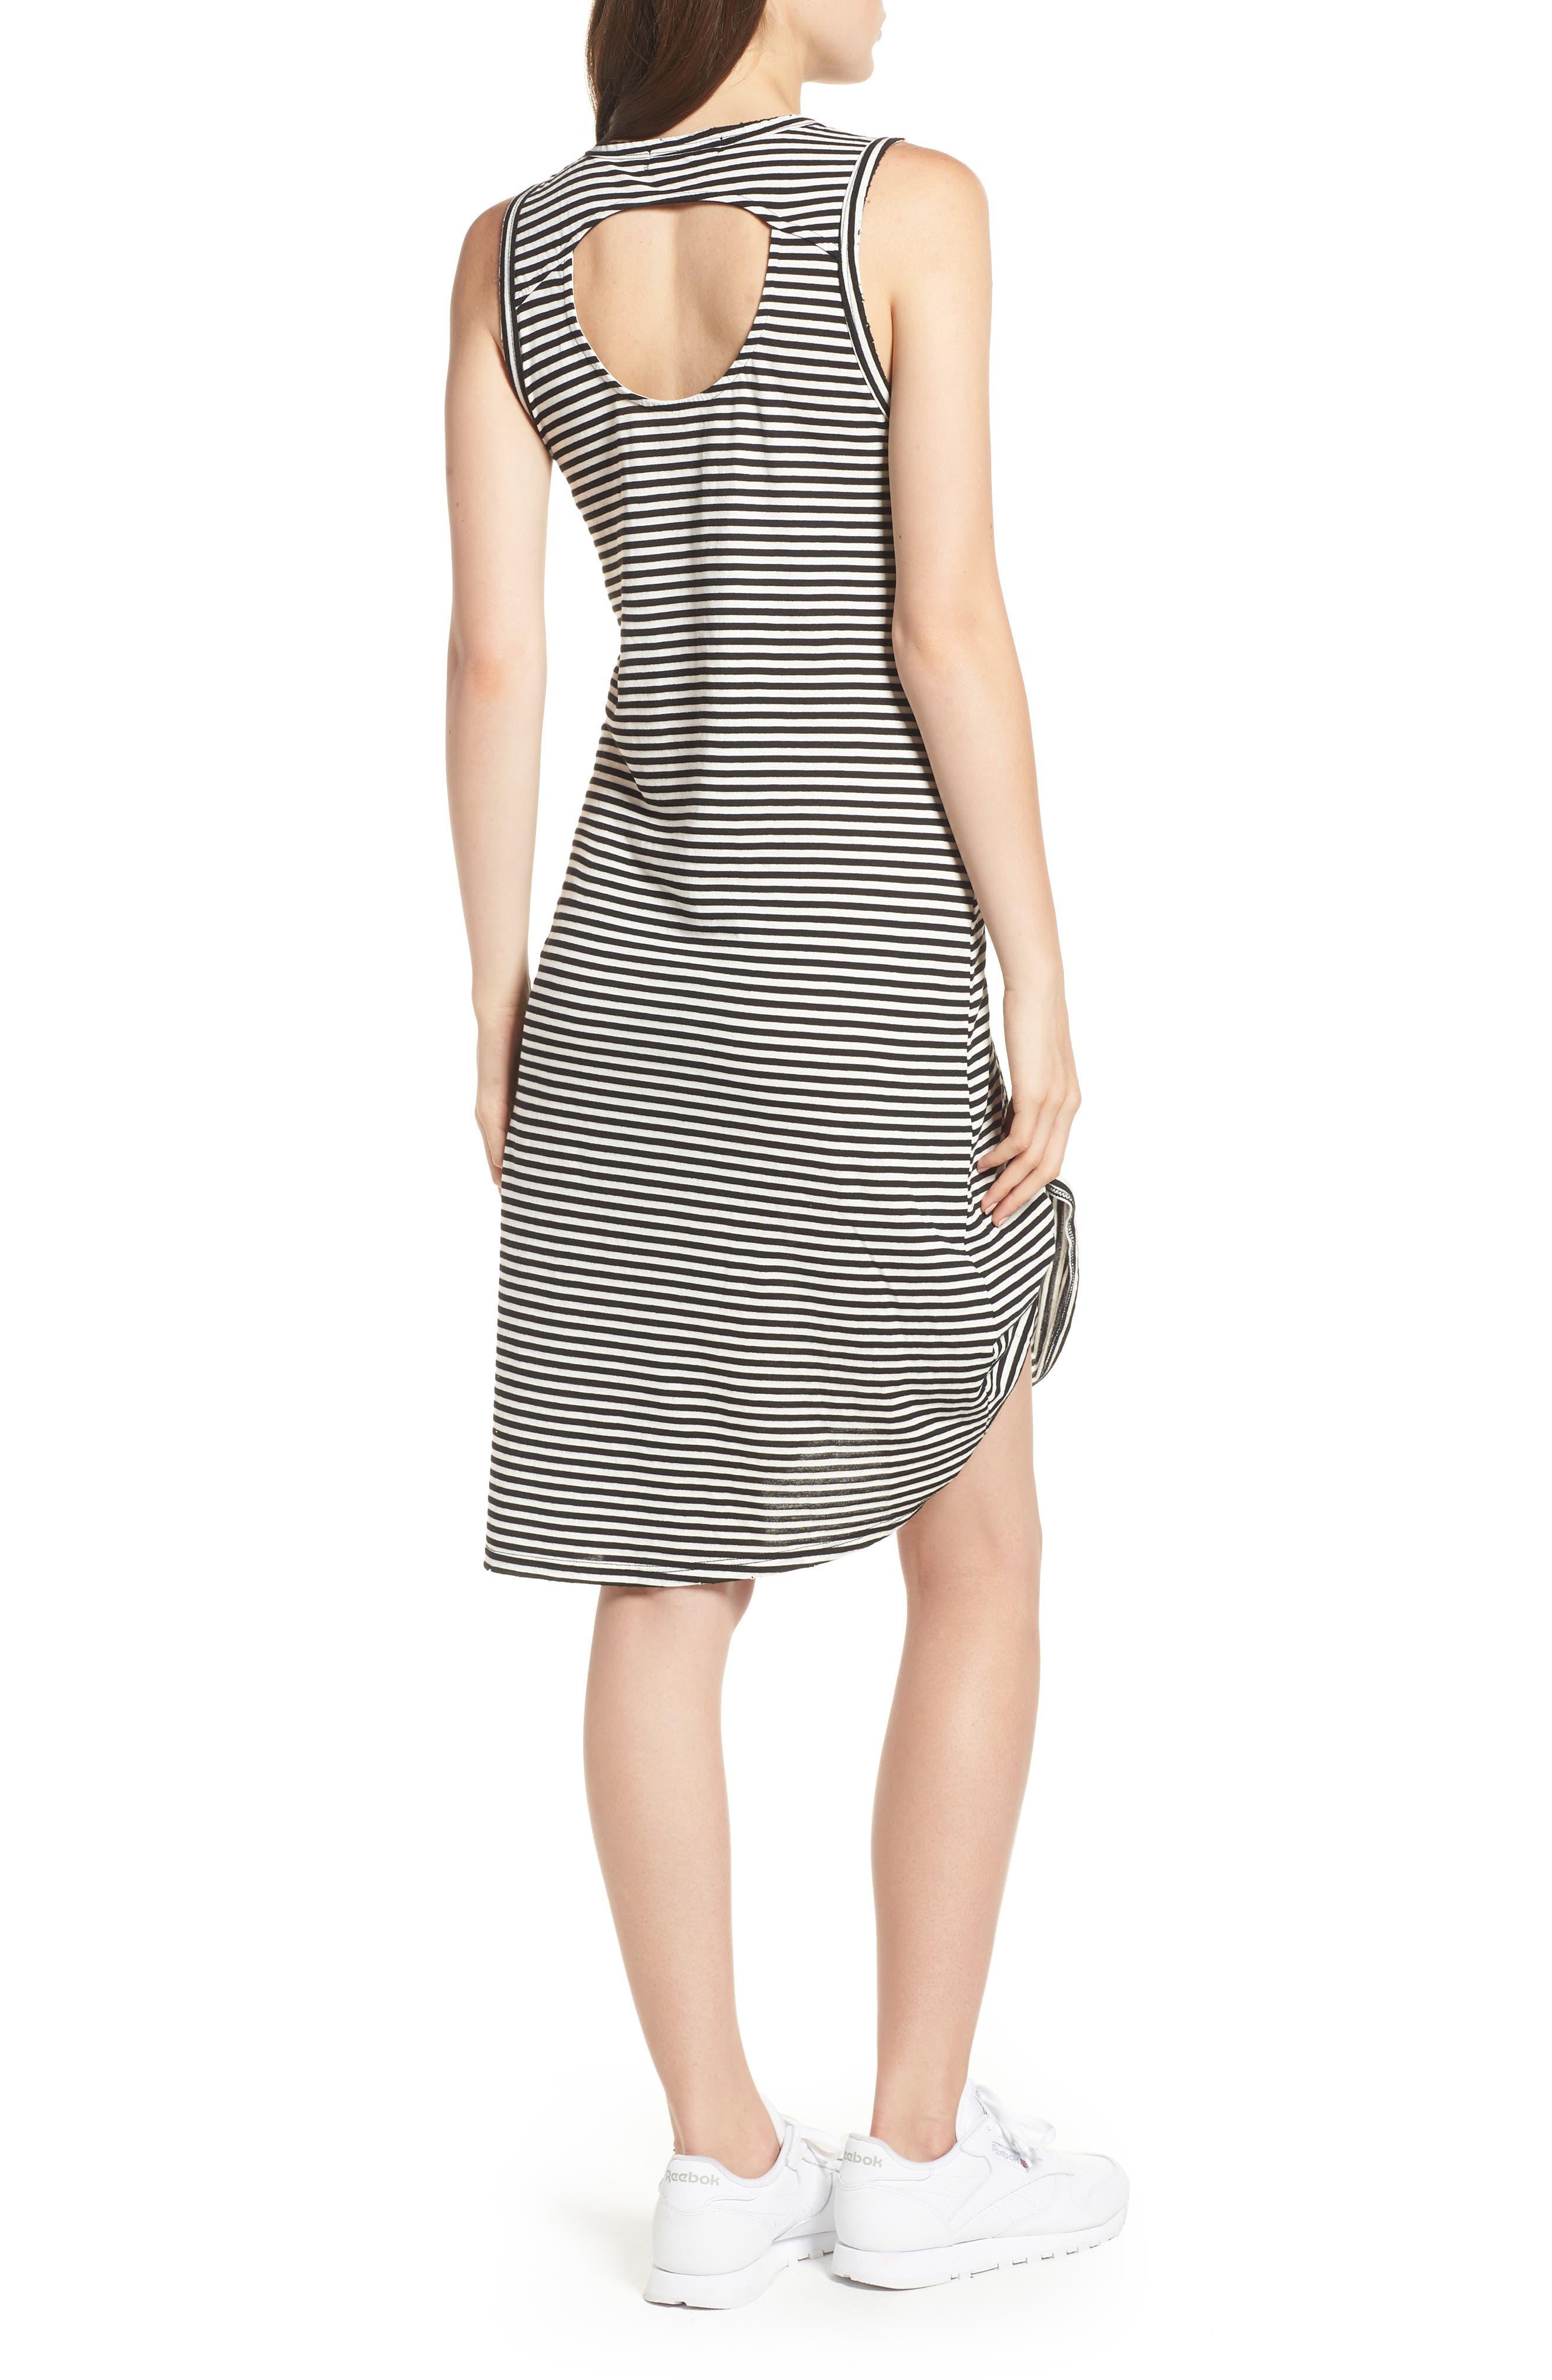 Boo Stripe High/Low Dress,                             Alternate thumbnail 2, color,                             Black Cat/ White Stripe